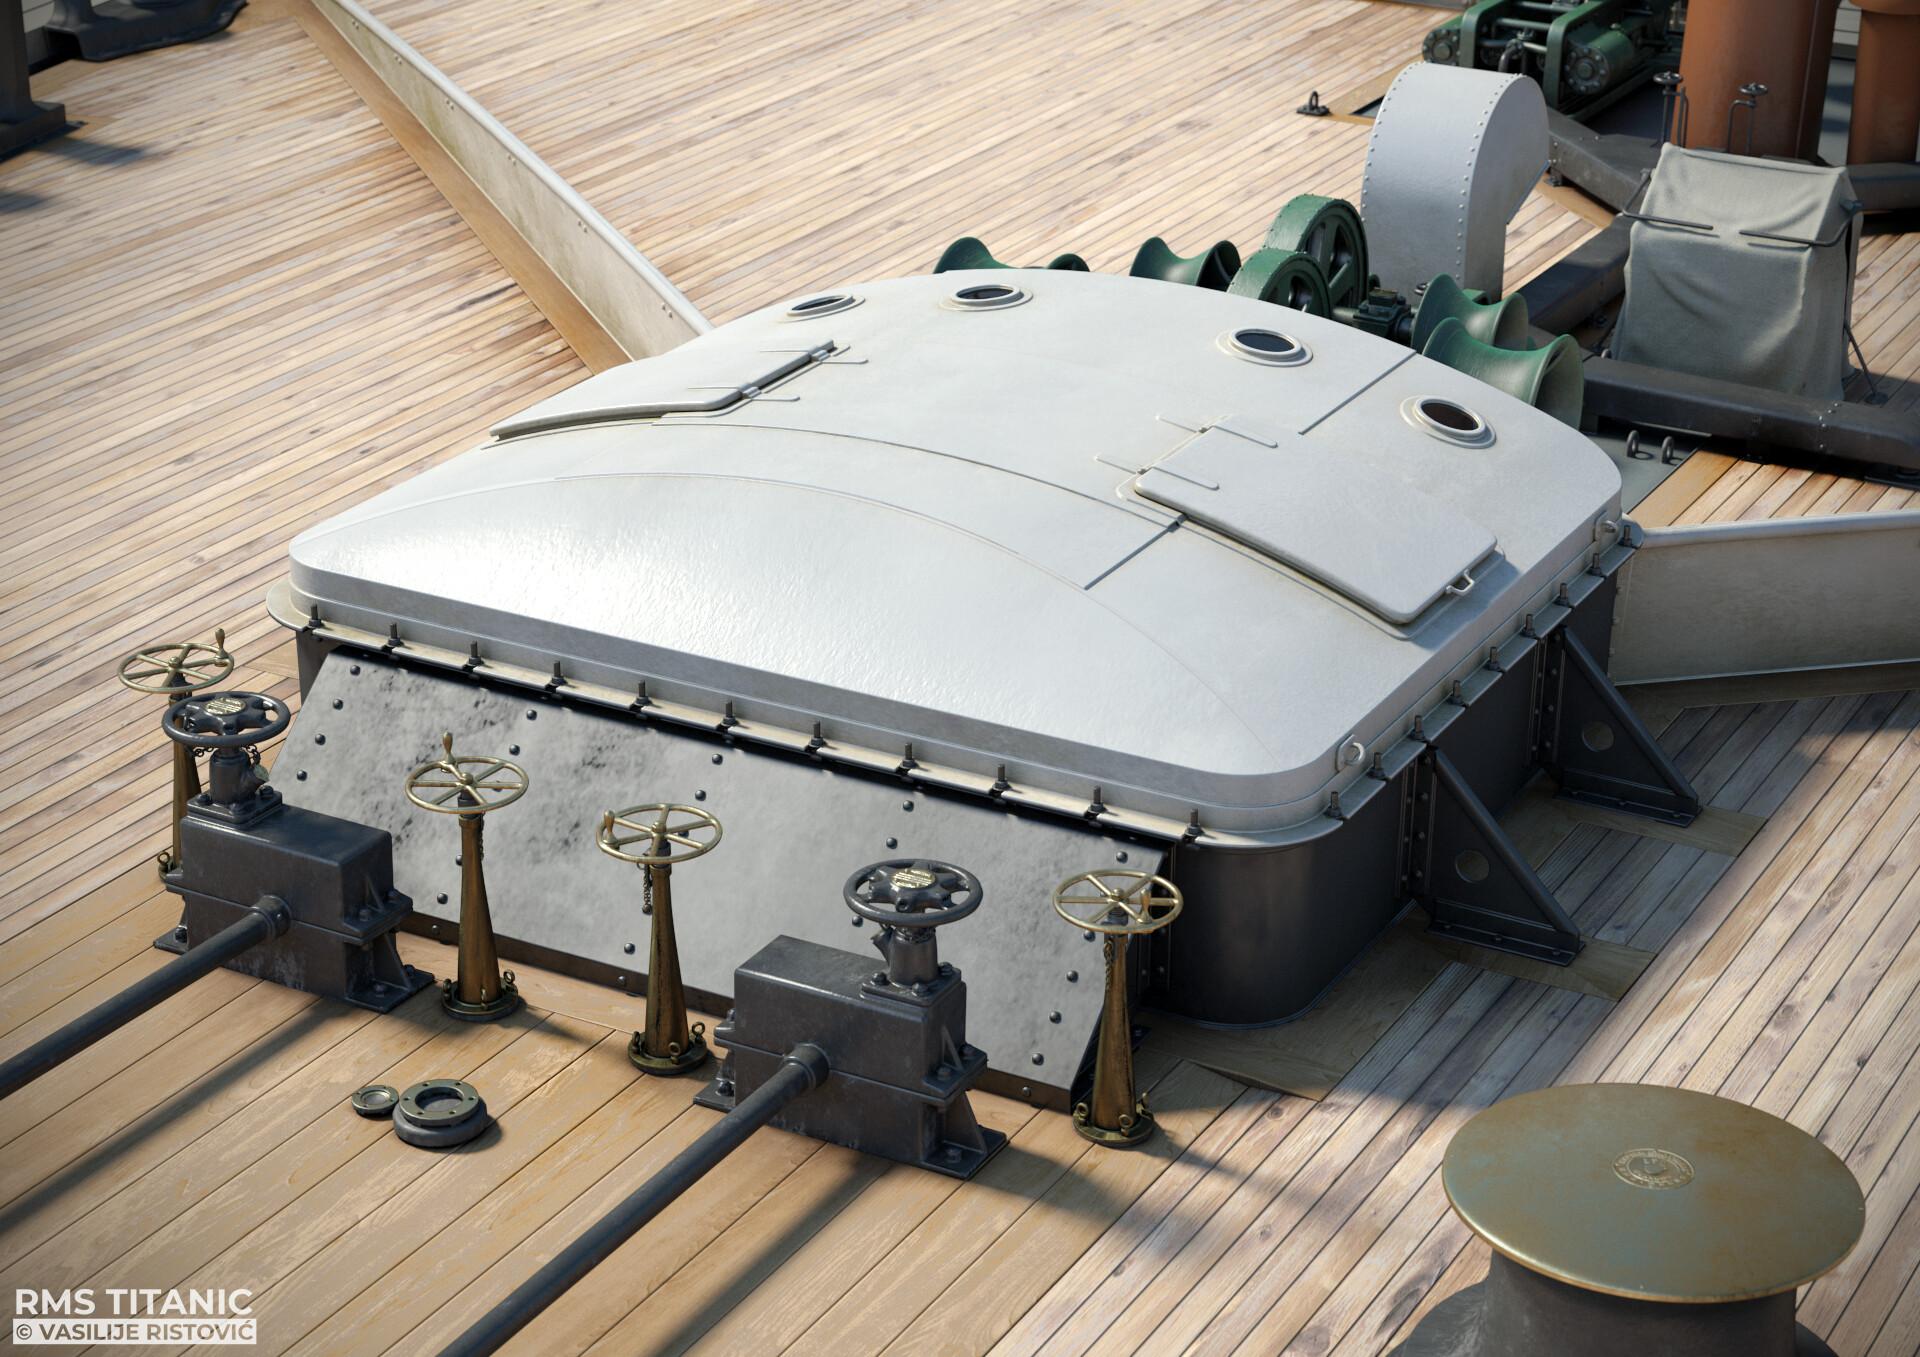 Montage Titanic Trumpeter 1/200 - Page 10 Vasilije-ristovic-hatch-1